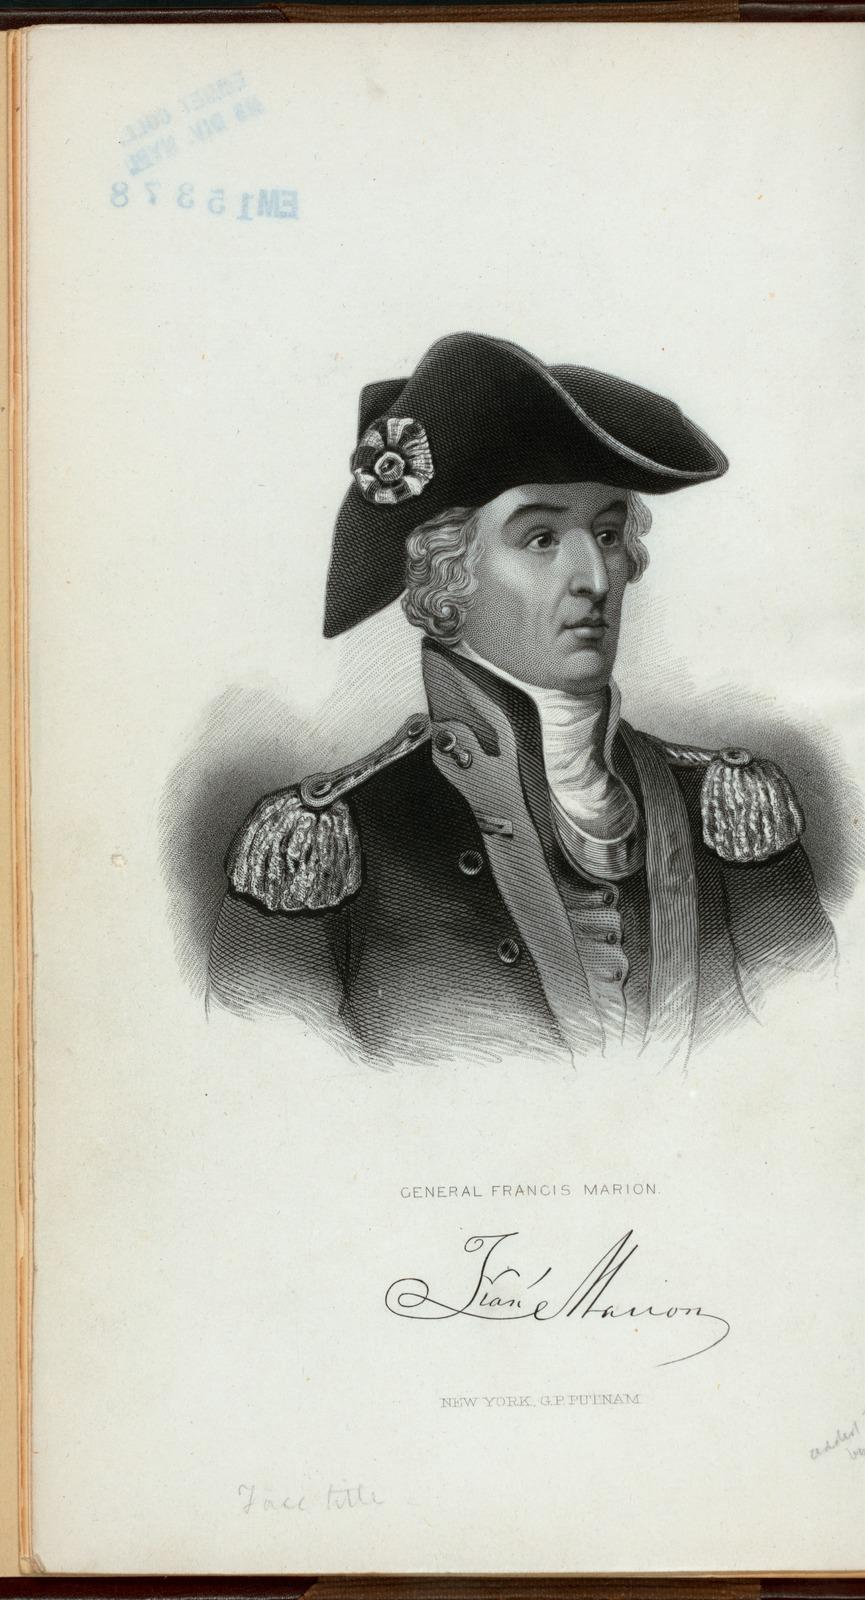 General Francis Marion.